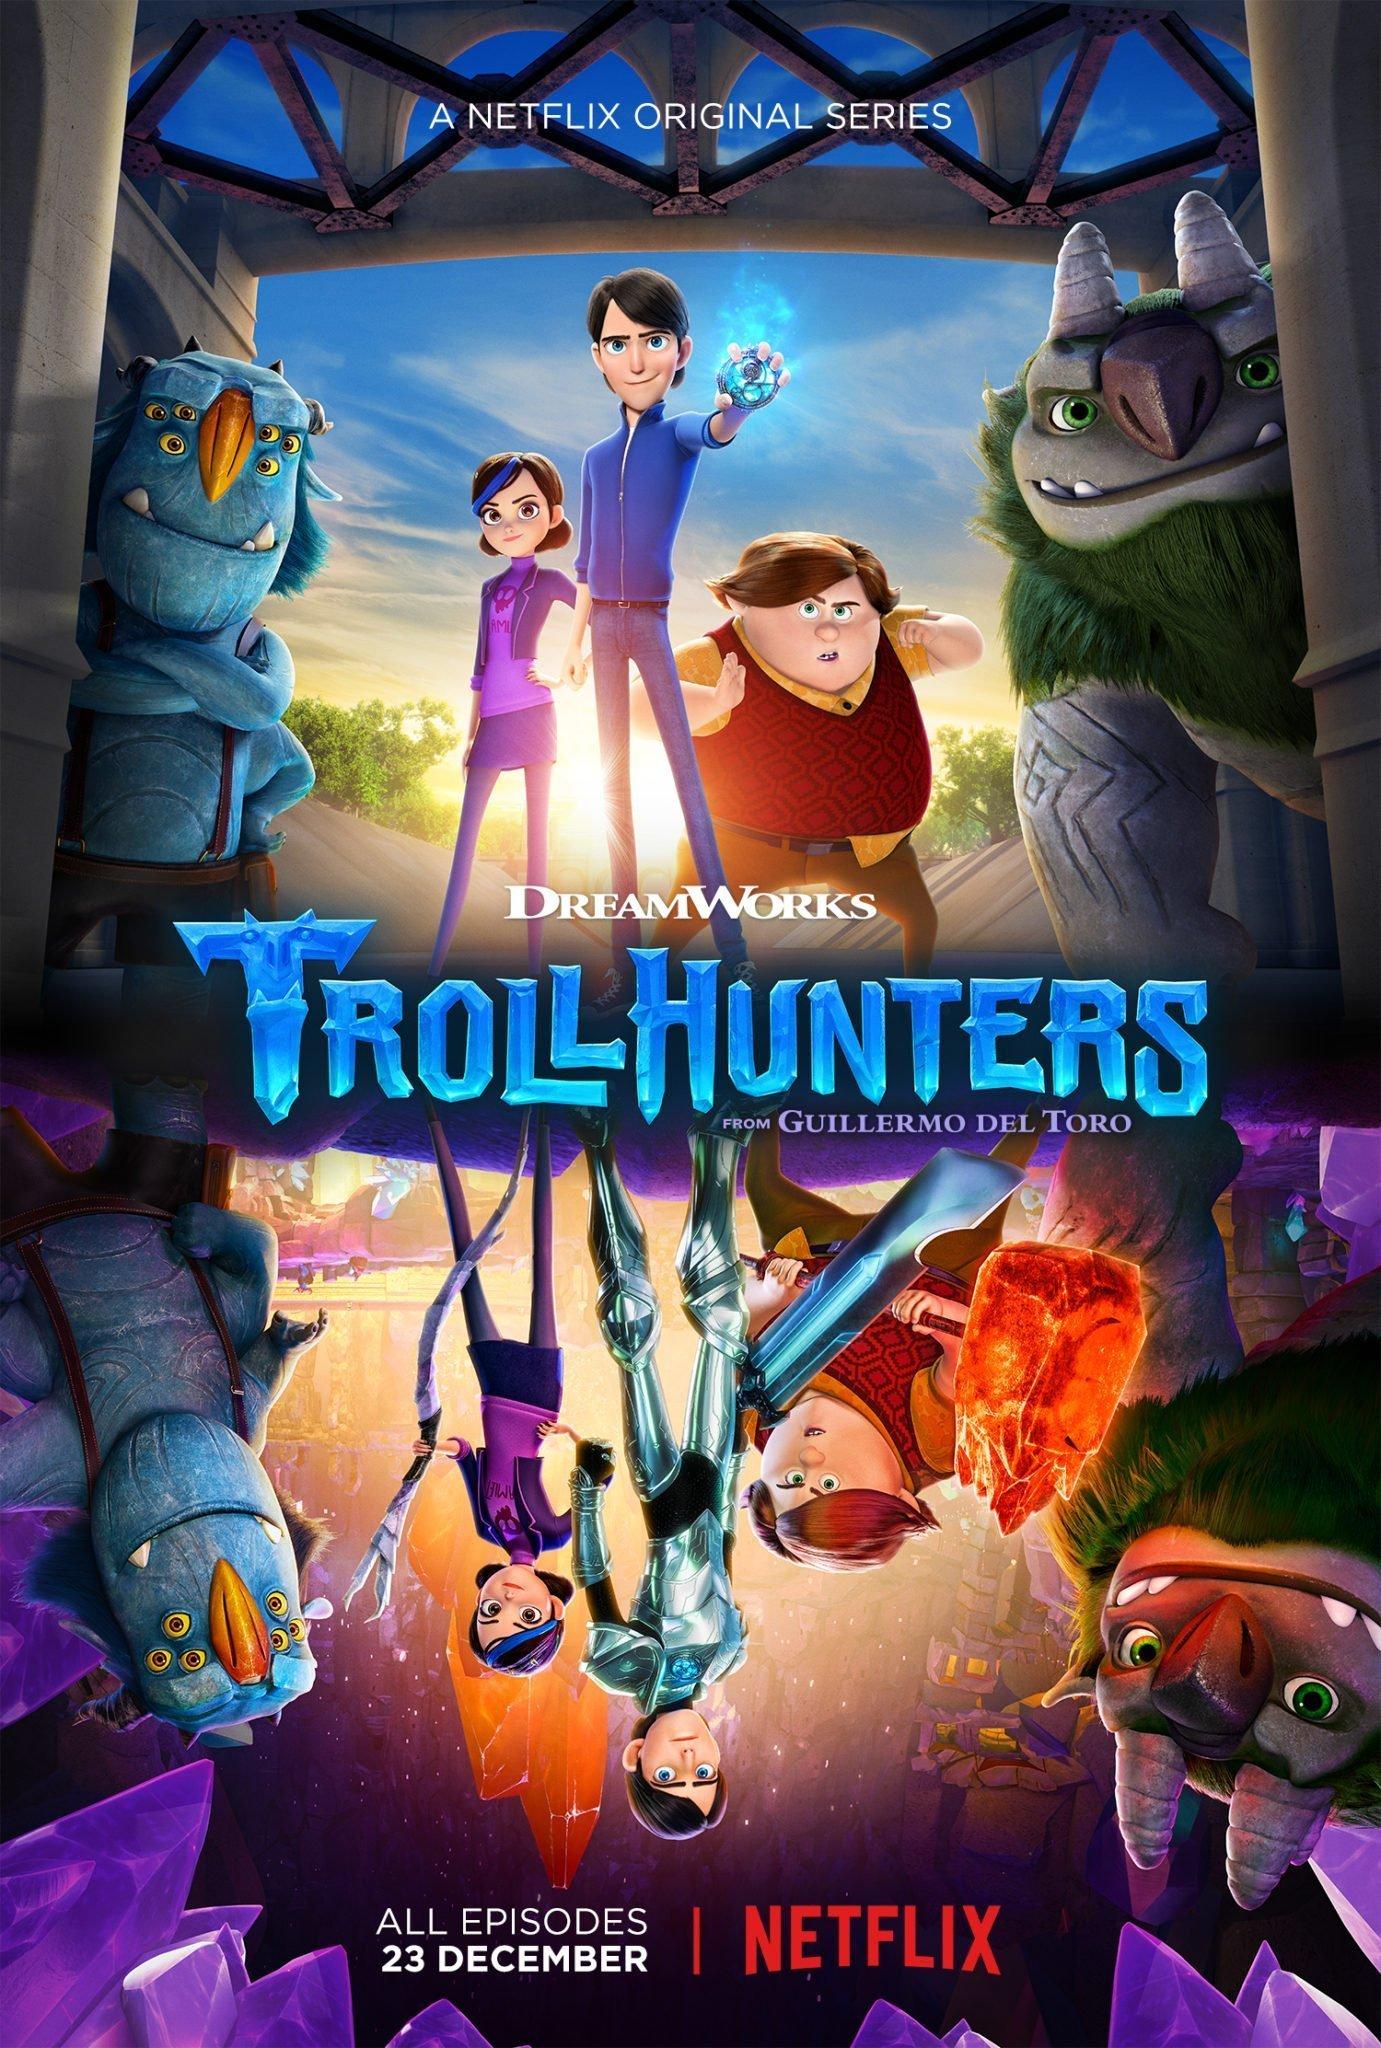 Troll Hunters on Netflix